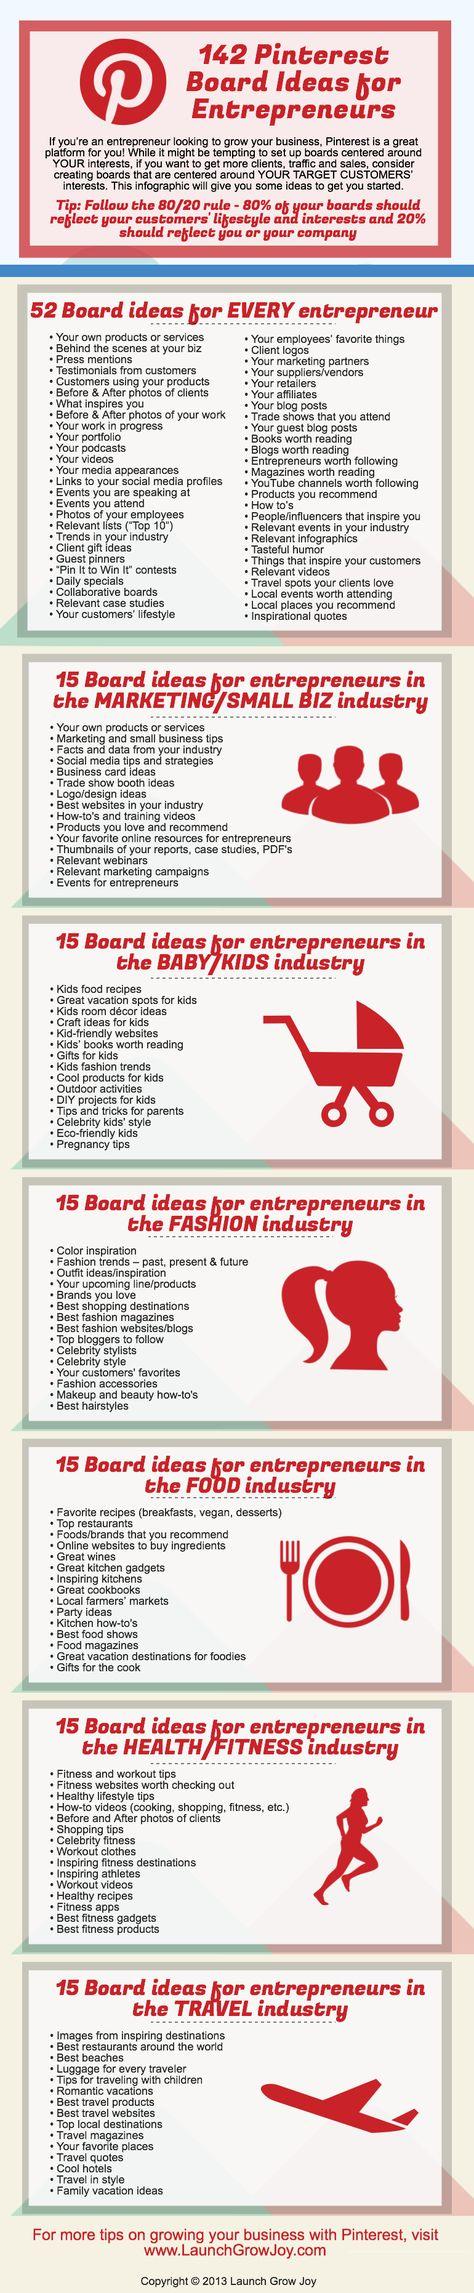 142 Pinterest Board Ideas for Entrepreneurs - Launch Grow Joy